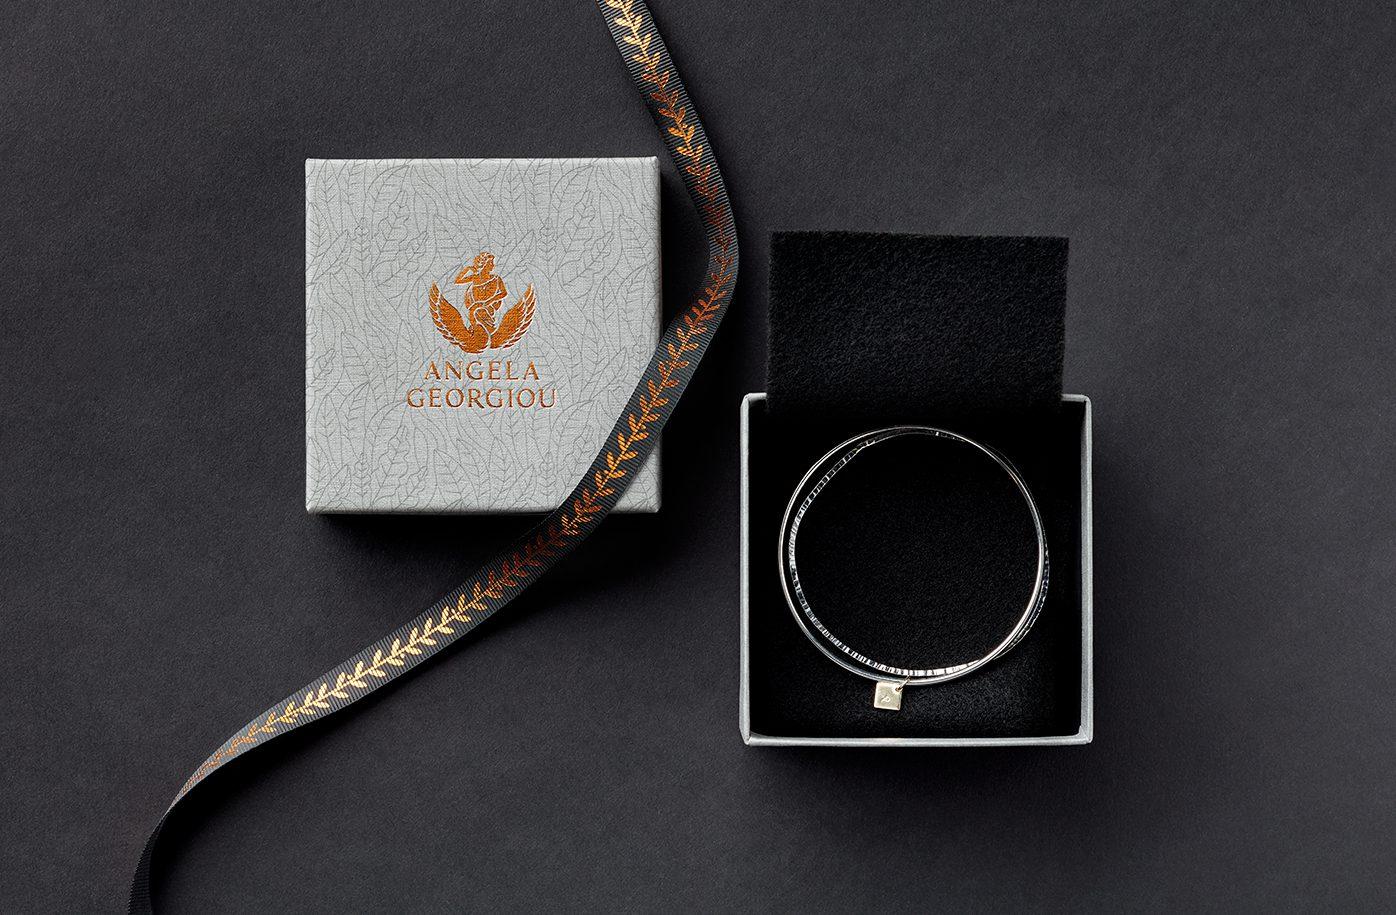 Angela-Georgiou-pattern-packaging-box-jewellery-2